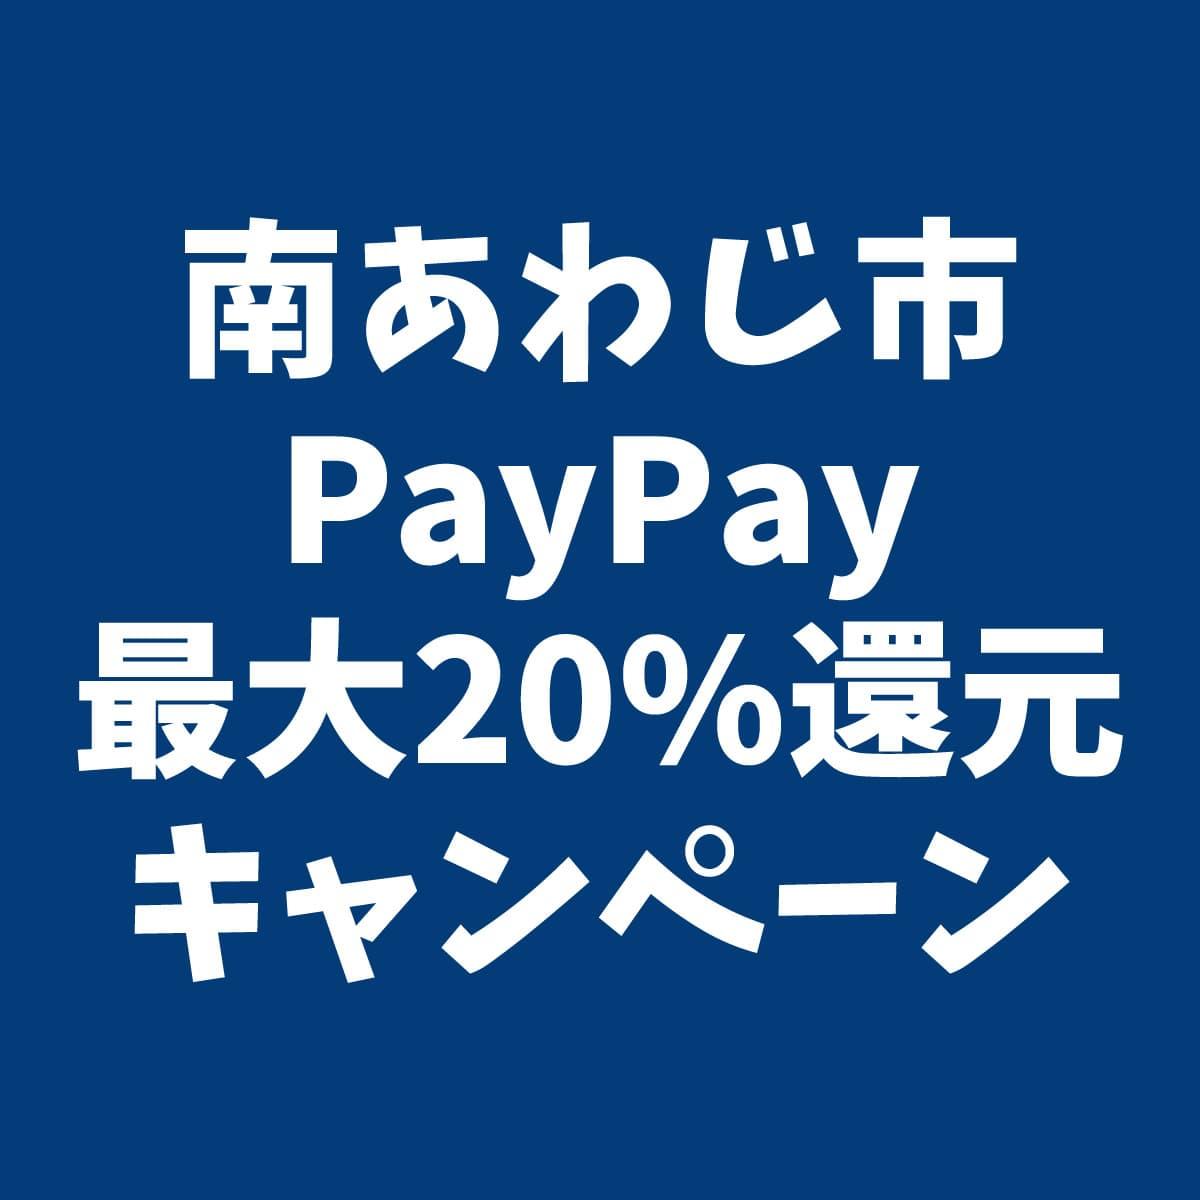 PayPay(ペイペイ)最大20%還元キャンペーン 南あわじ市